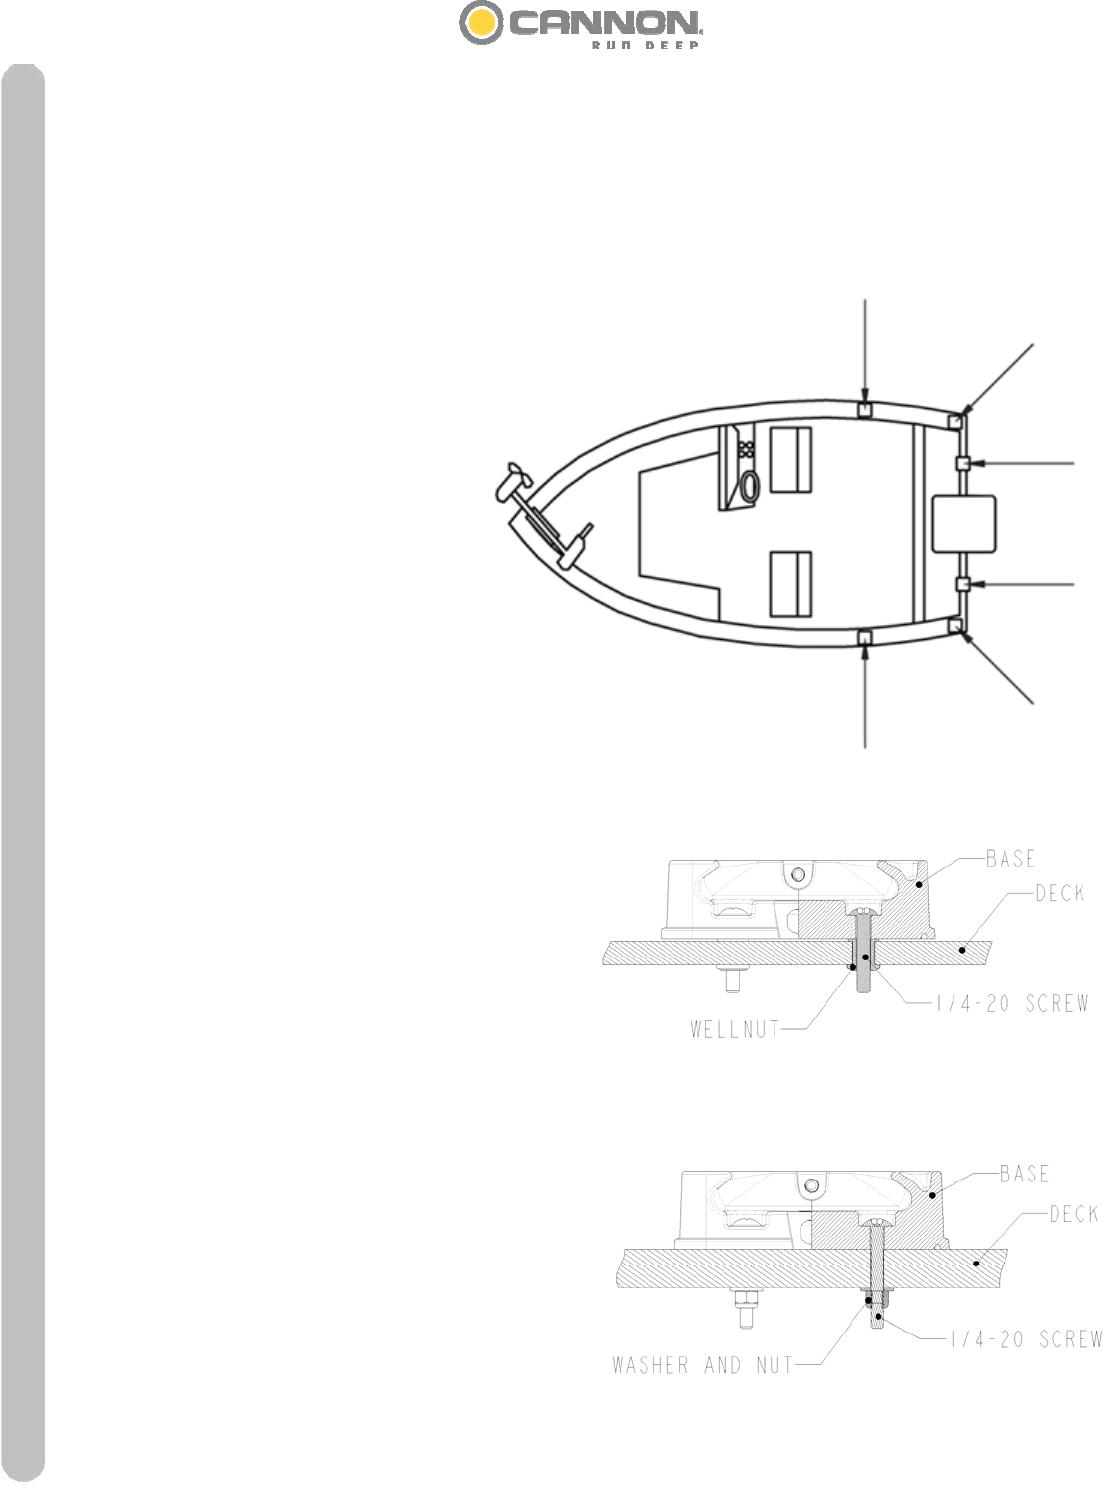 Wiring Diagram Cannon Downrigger